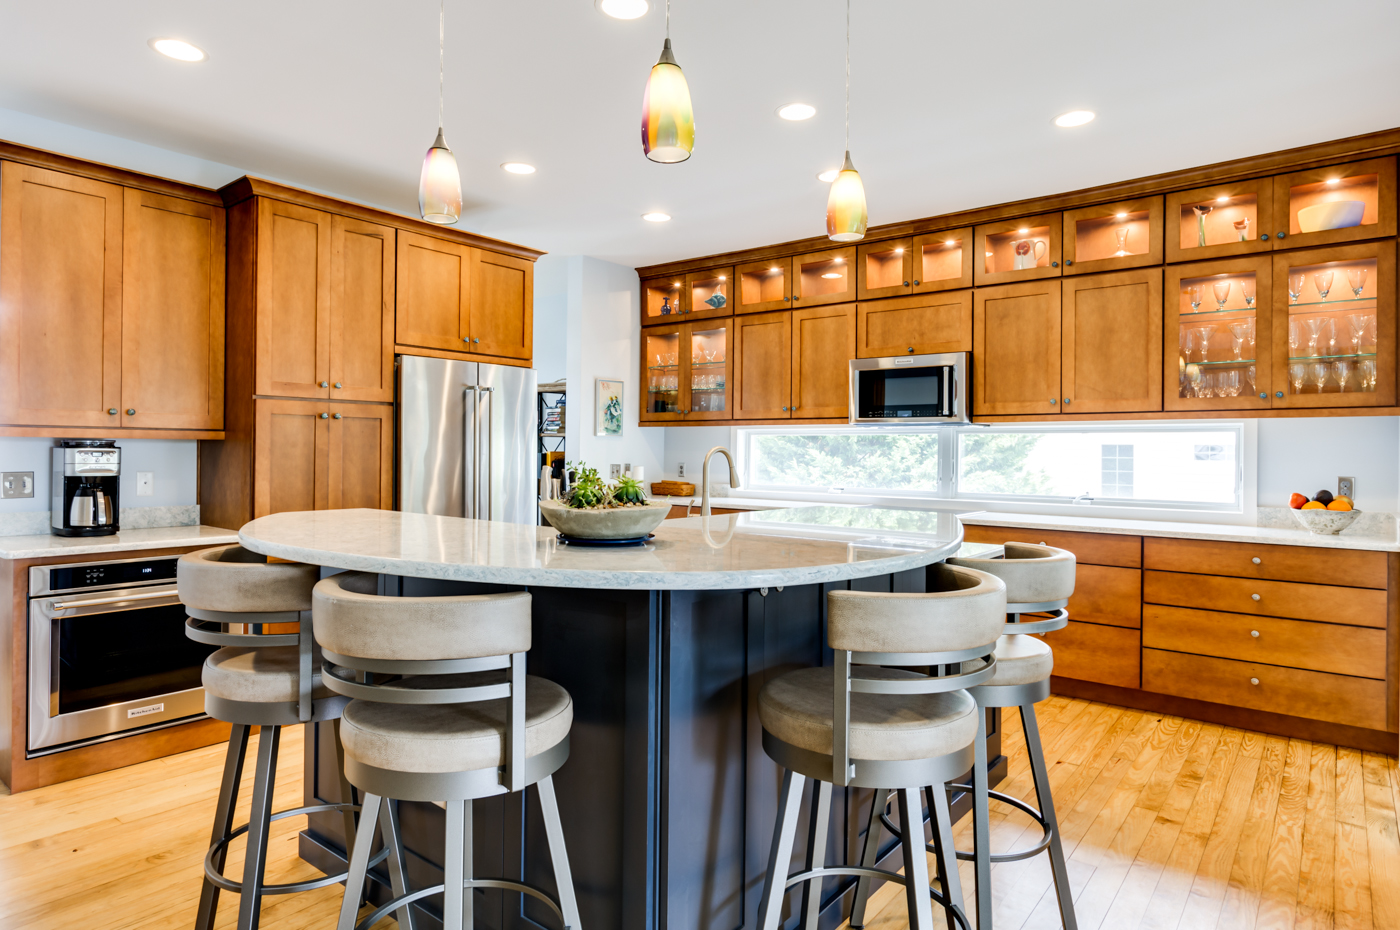 Project Spotlight: A Contemporary Coastal Kitchen